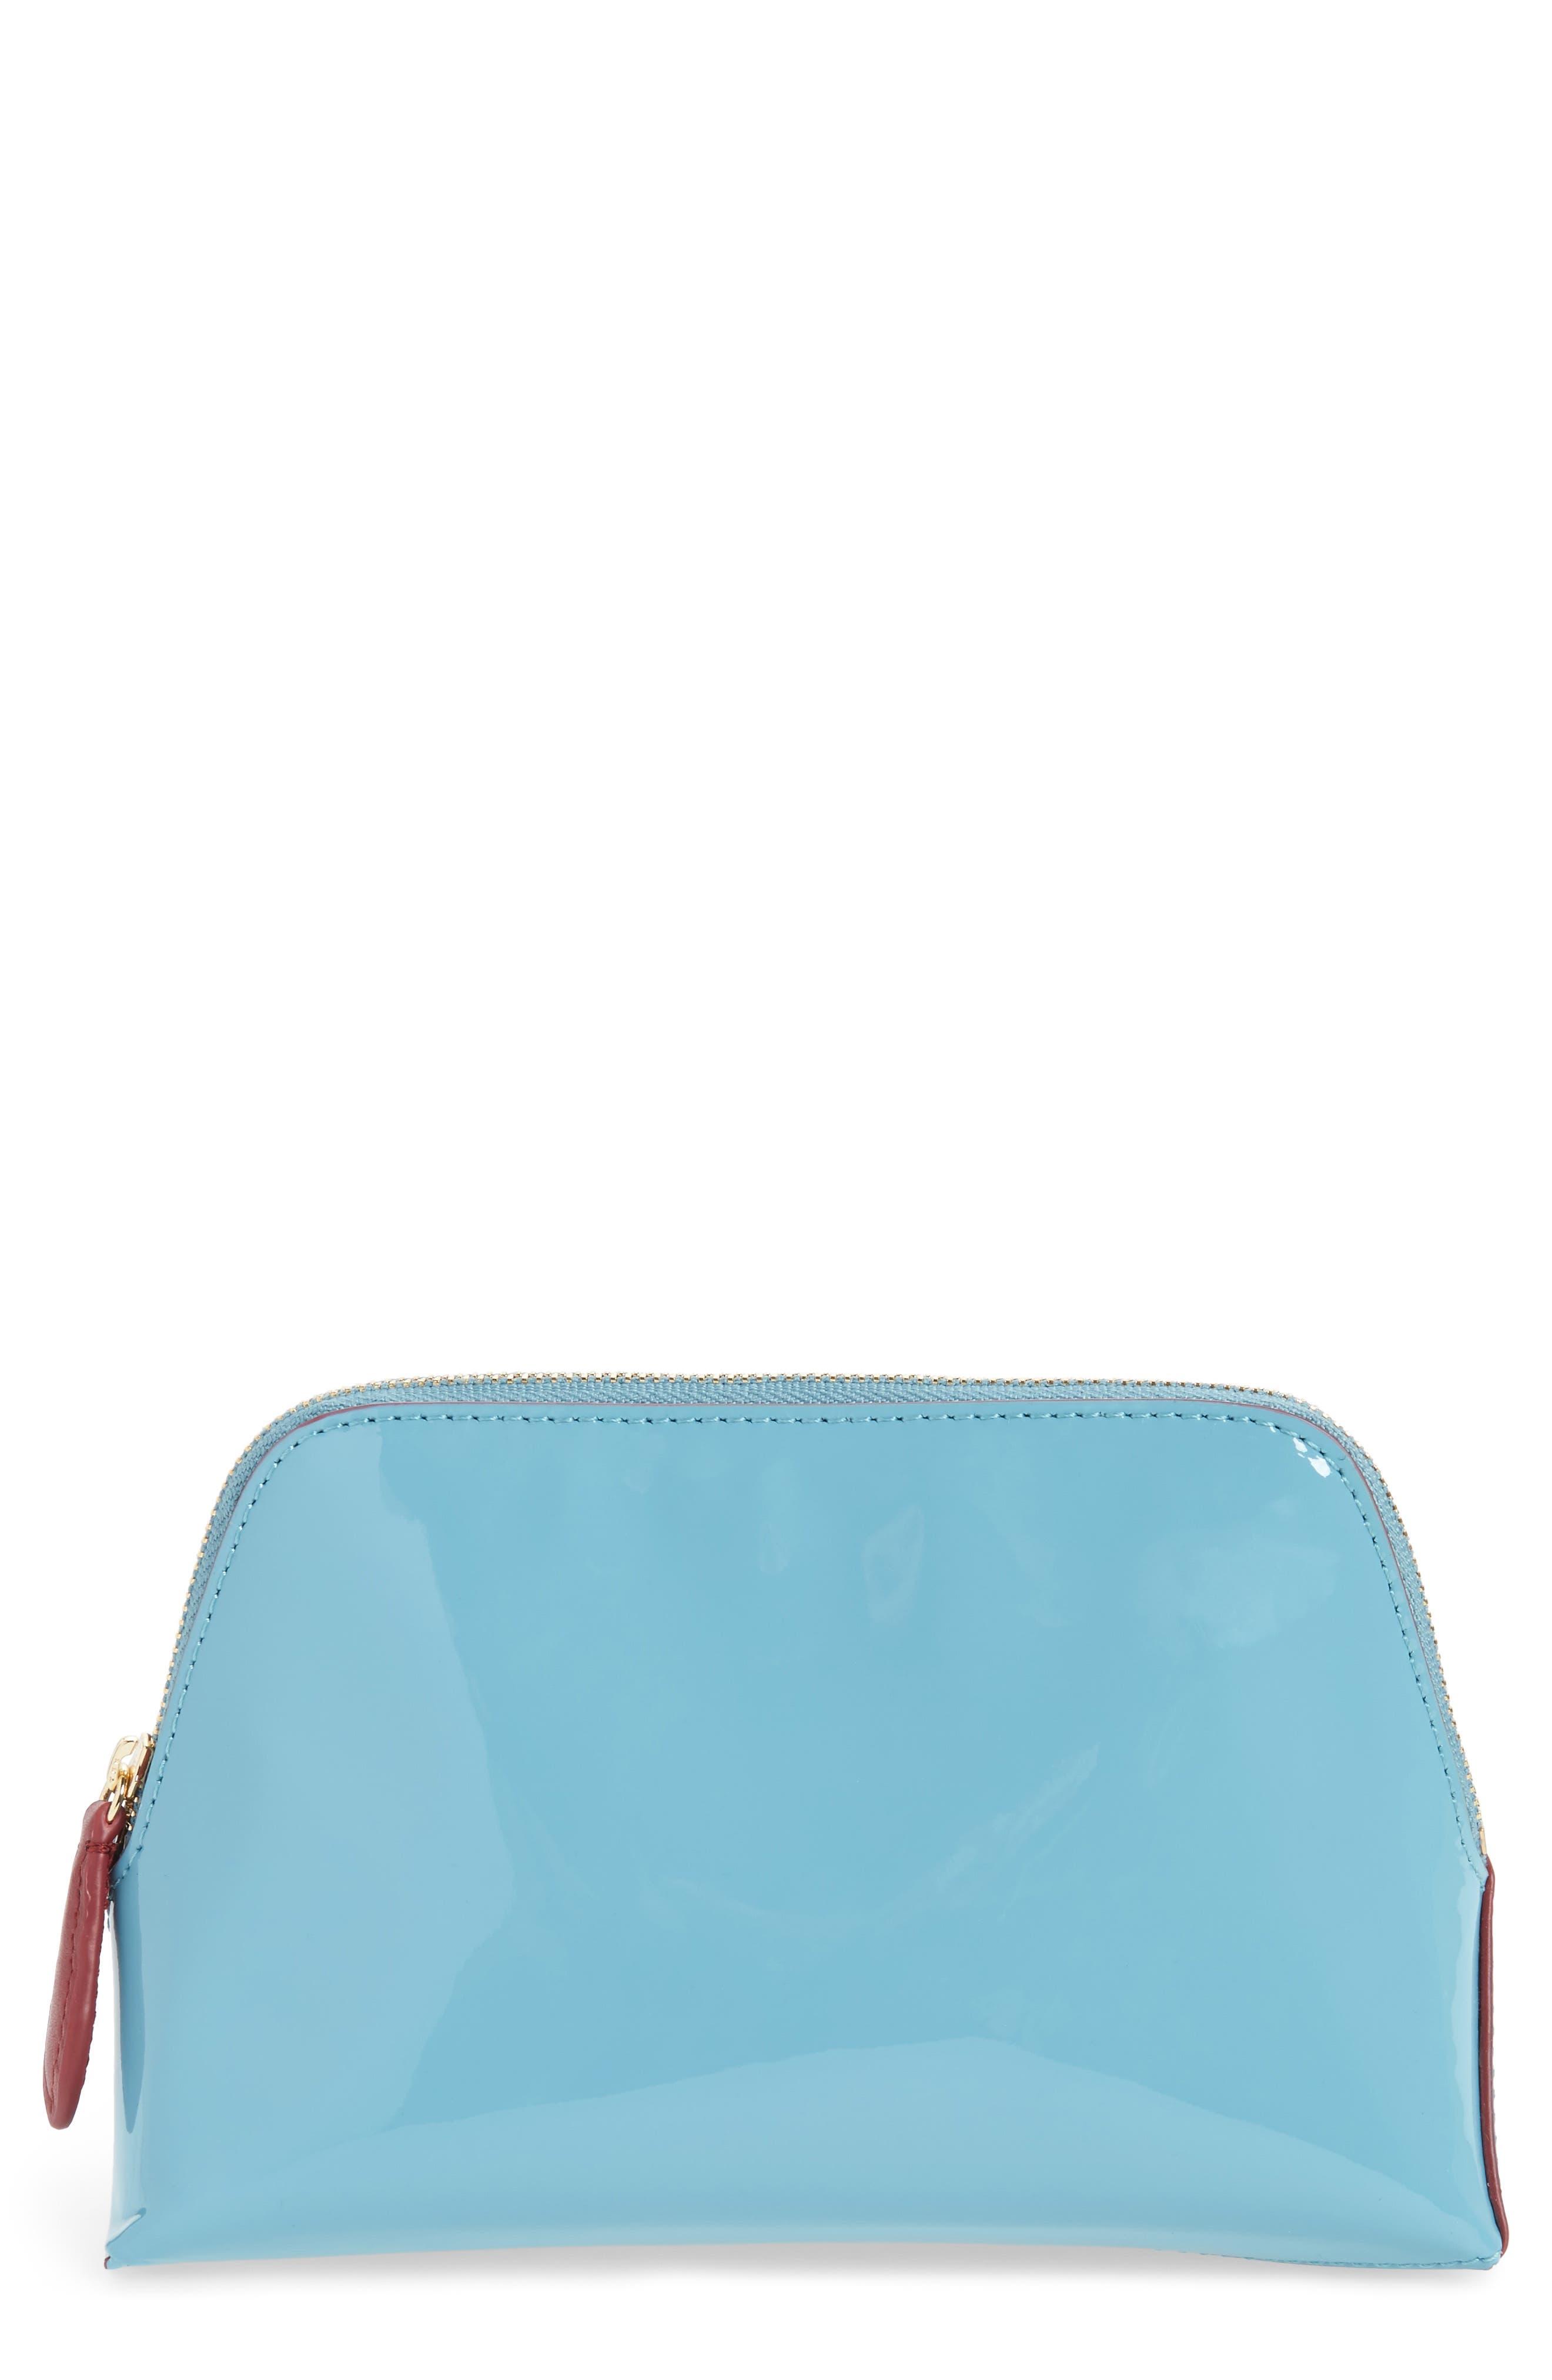 Leather Cosmetics Pouch,                         Main,                         color, Aqua